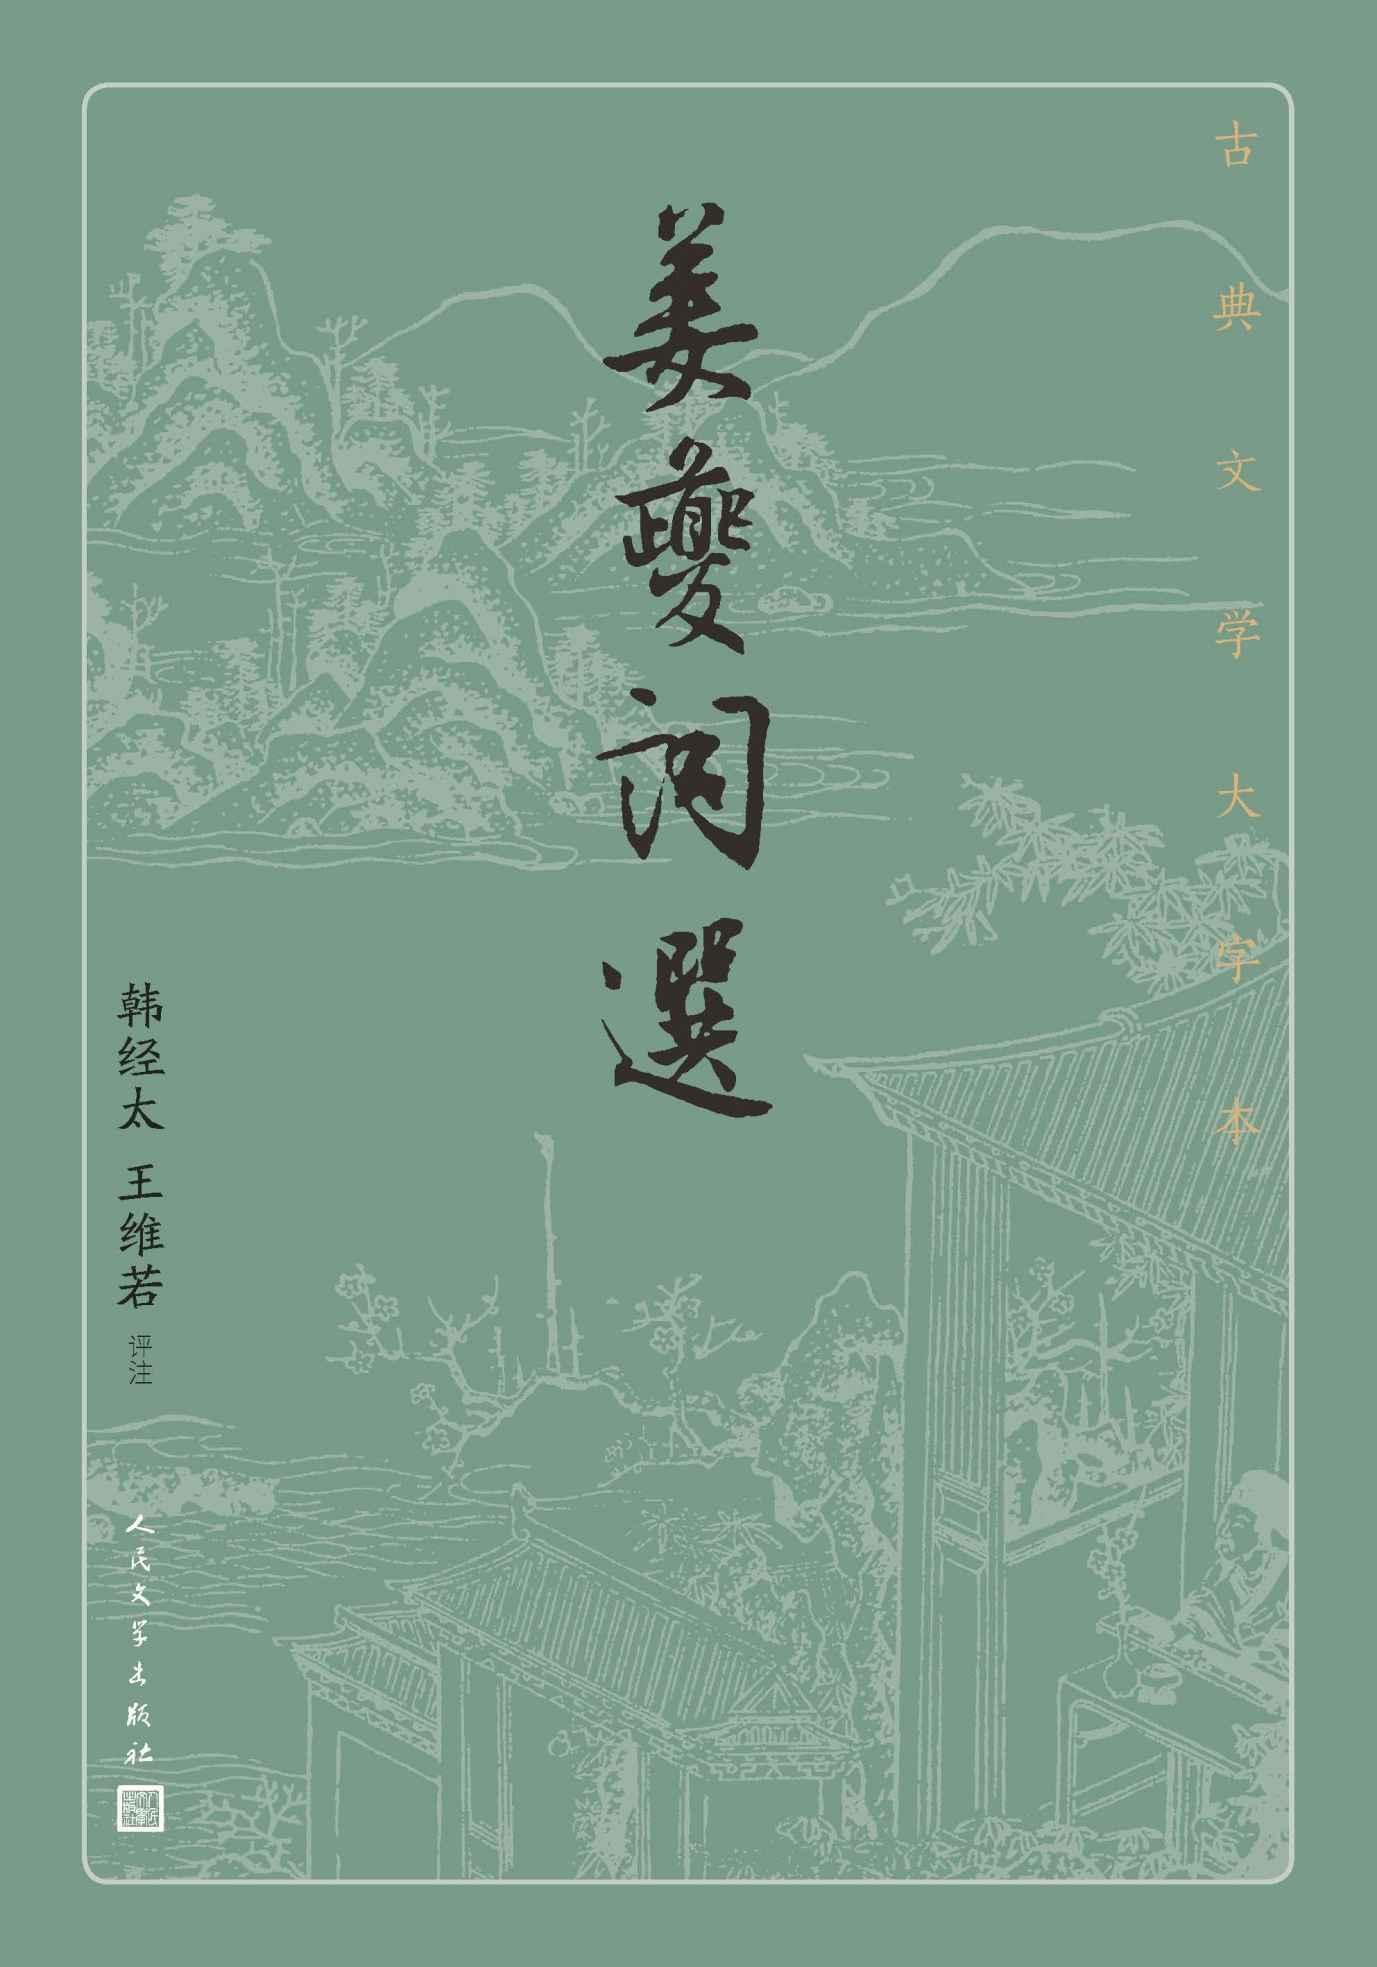 姜夔词选pdf-epub-mobi-txt-azw3